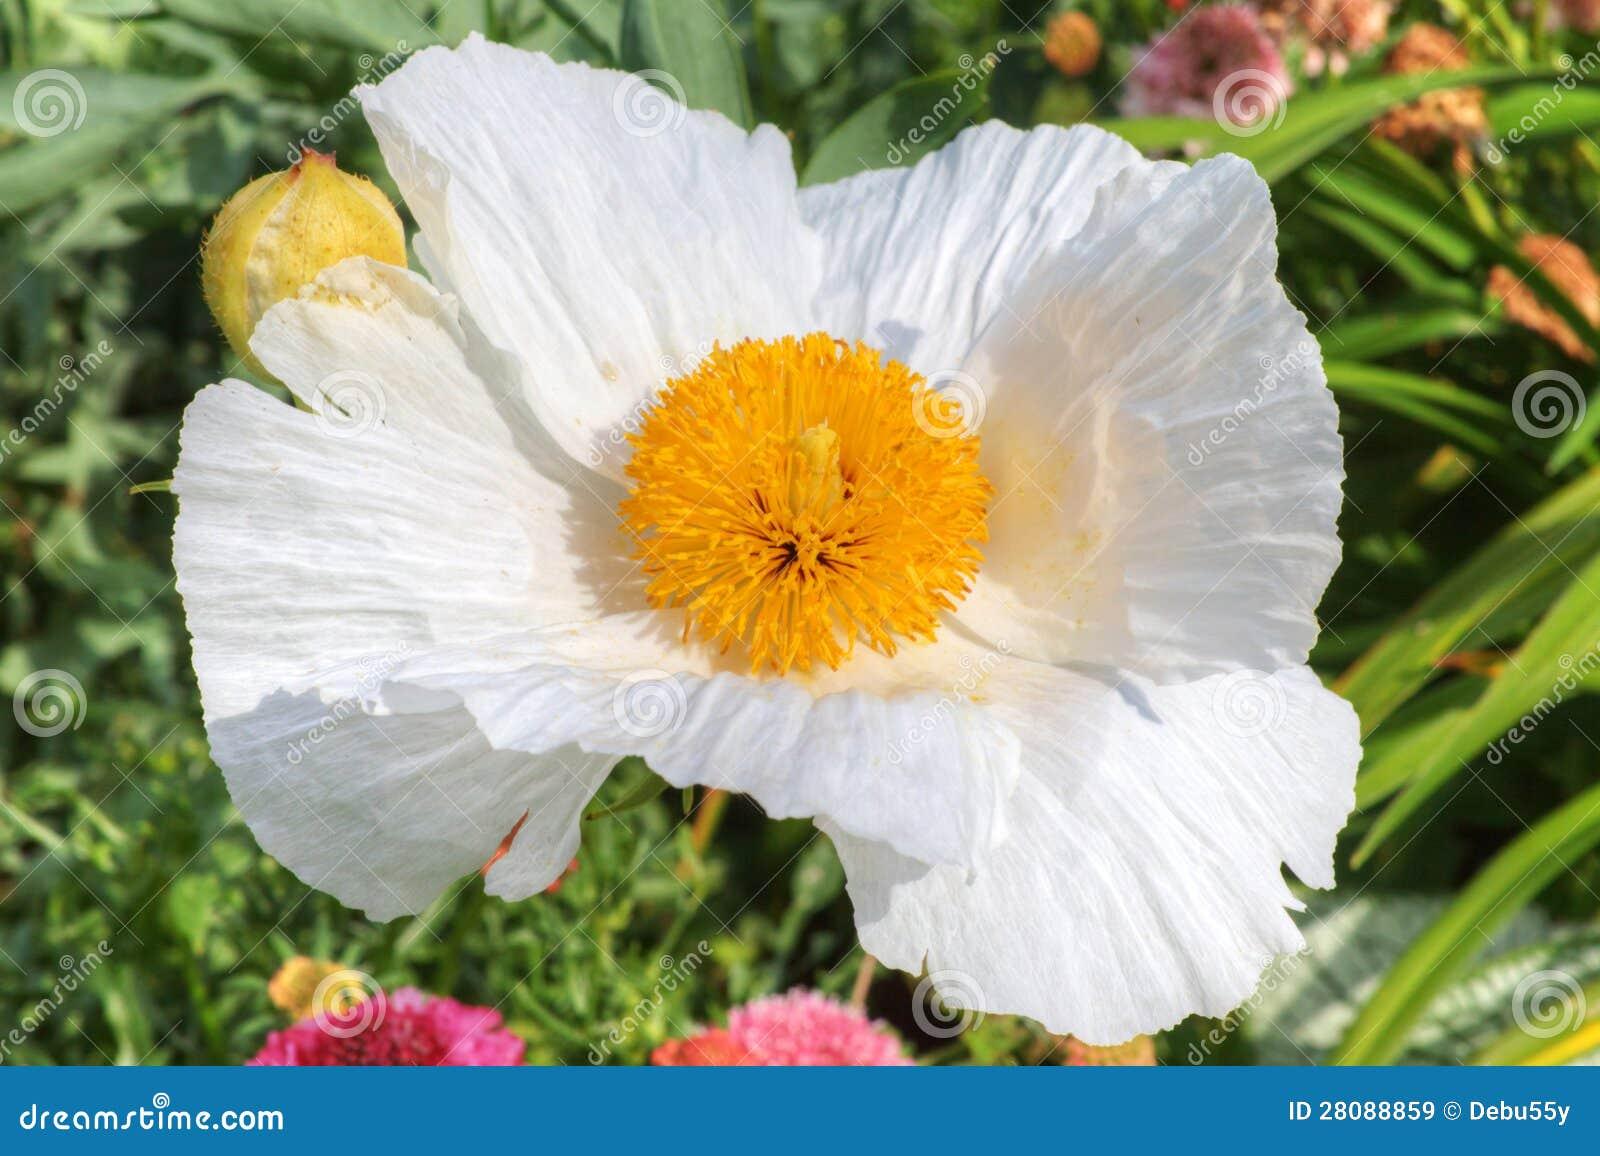 White Tree Poppy Flower Stock Image Image Of Matillija 28088859